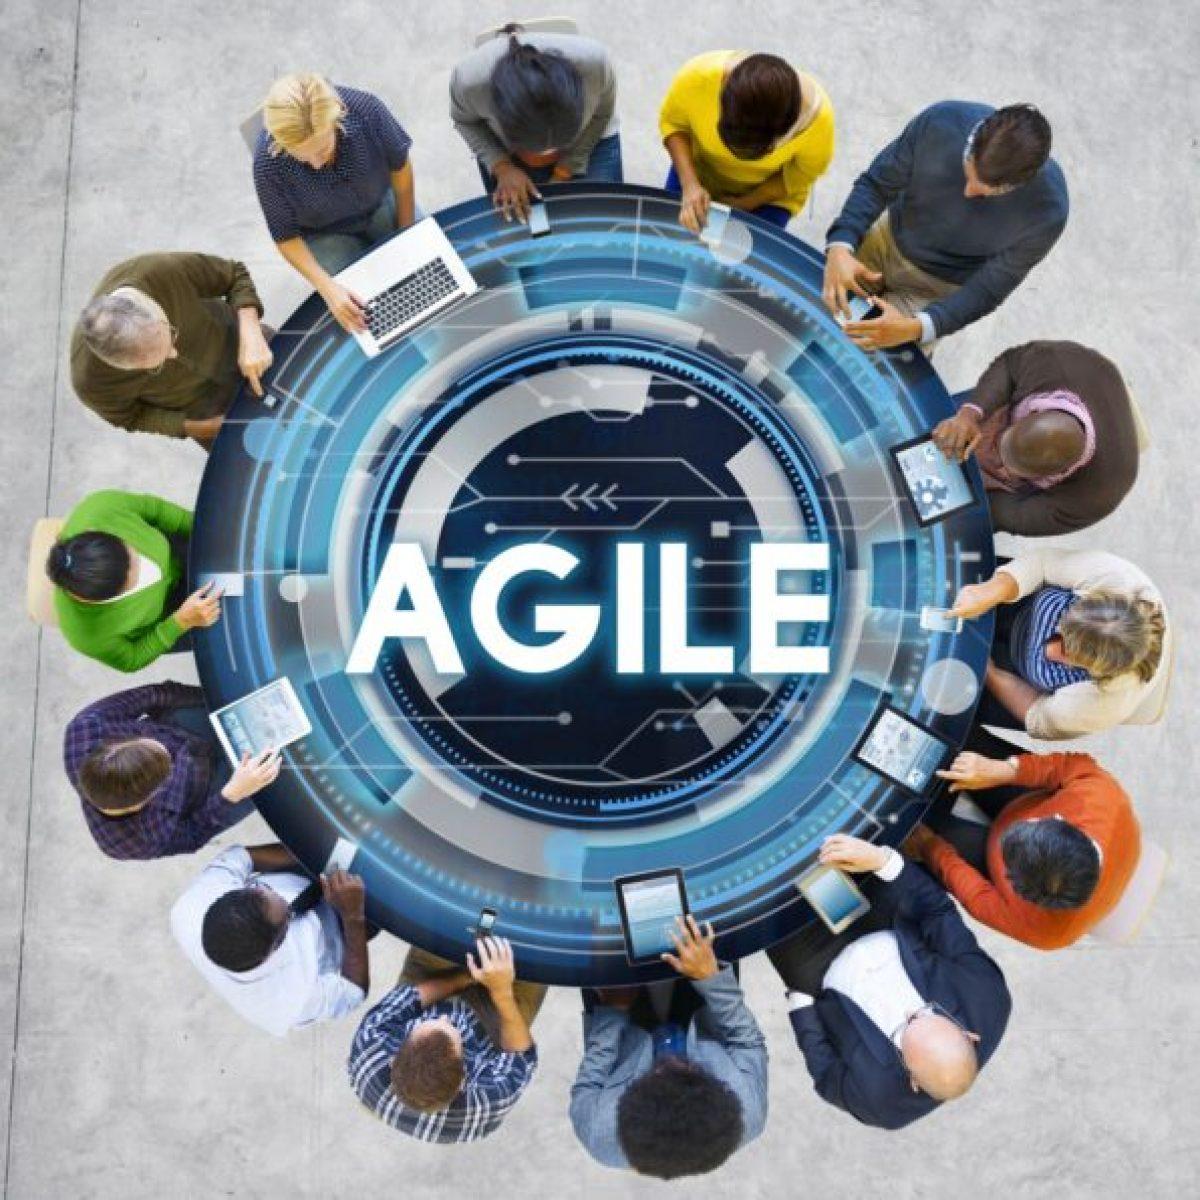 Sapmee-20191008-Blog-Agile-Scrum-Master-Kanban-Xtreme-Programming-Metodologías-ágiles-e1570560310779